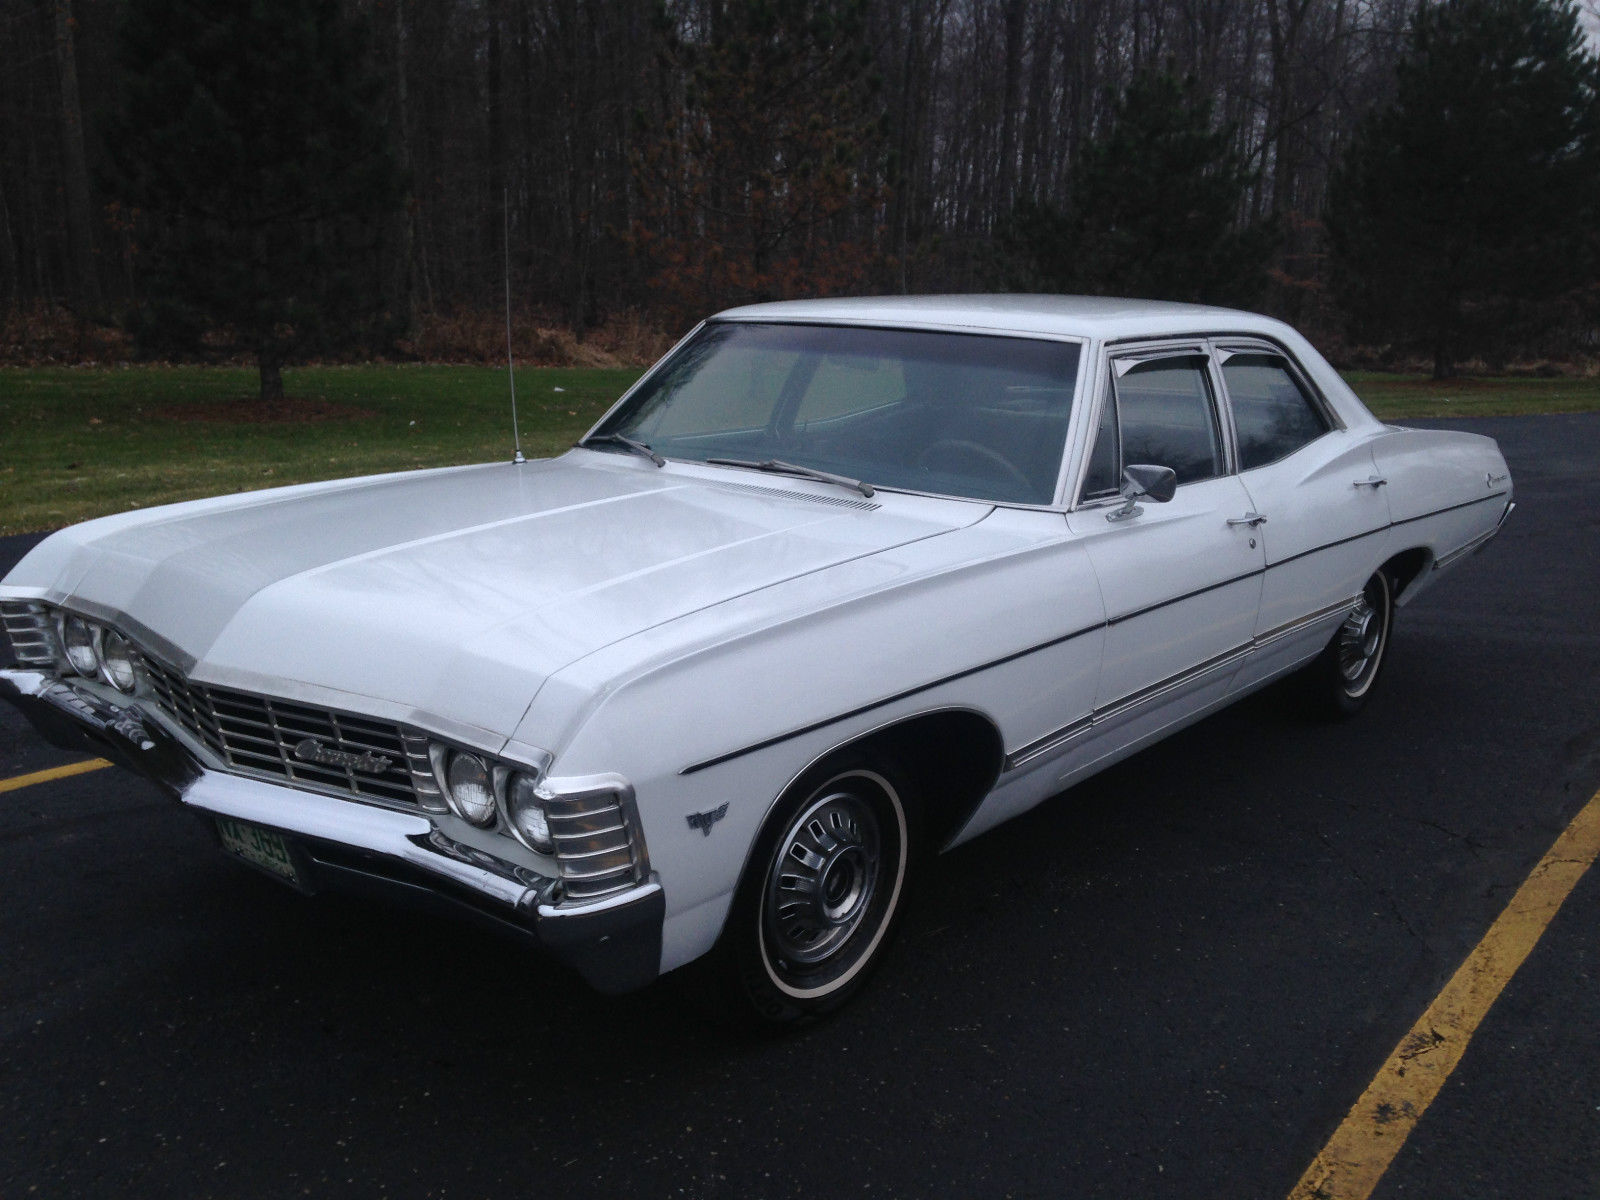 1967 cheverolet impala 4 door supernatural car no reserve free shipping classic chevrolet. Black Bedroom Furniture Sets. Home Design Ideas